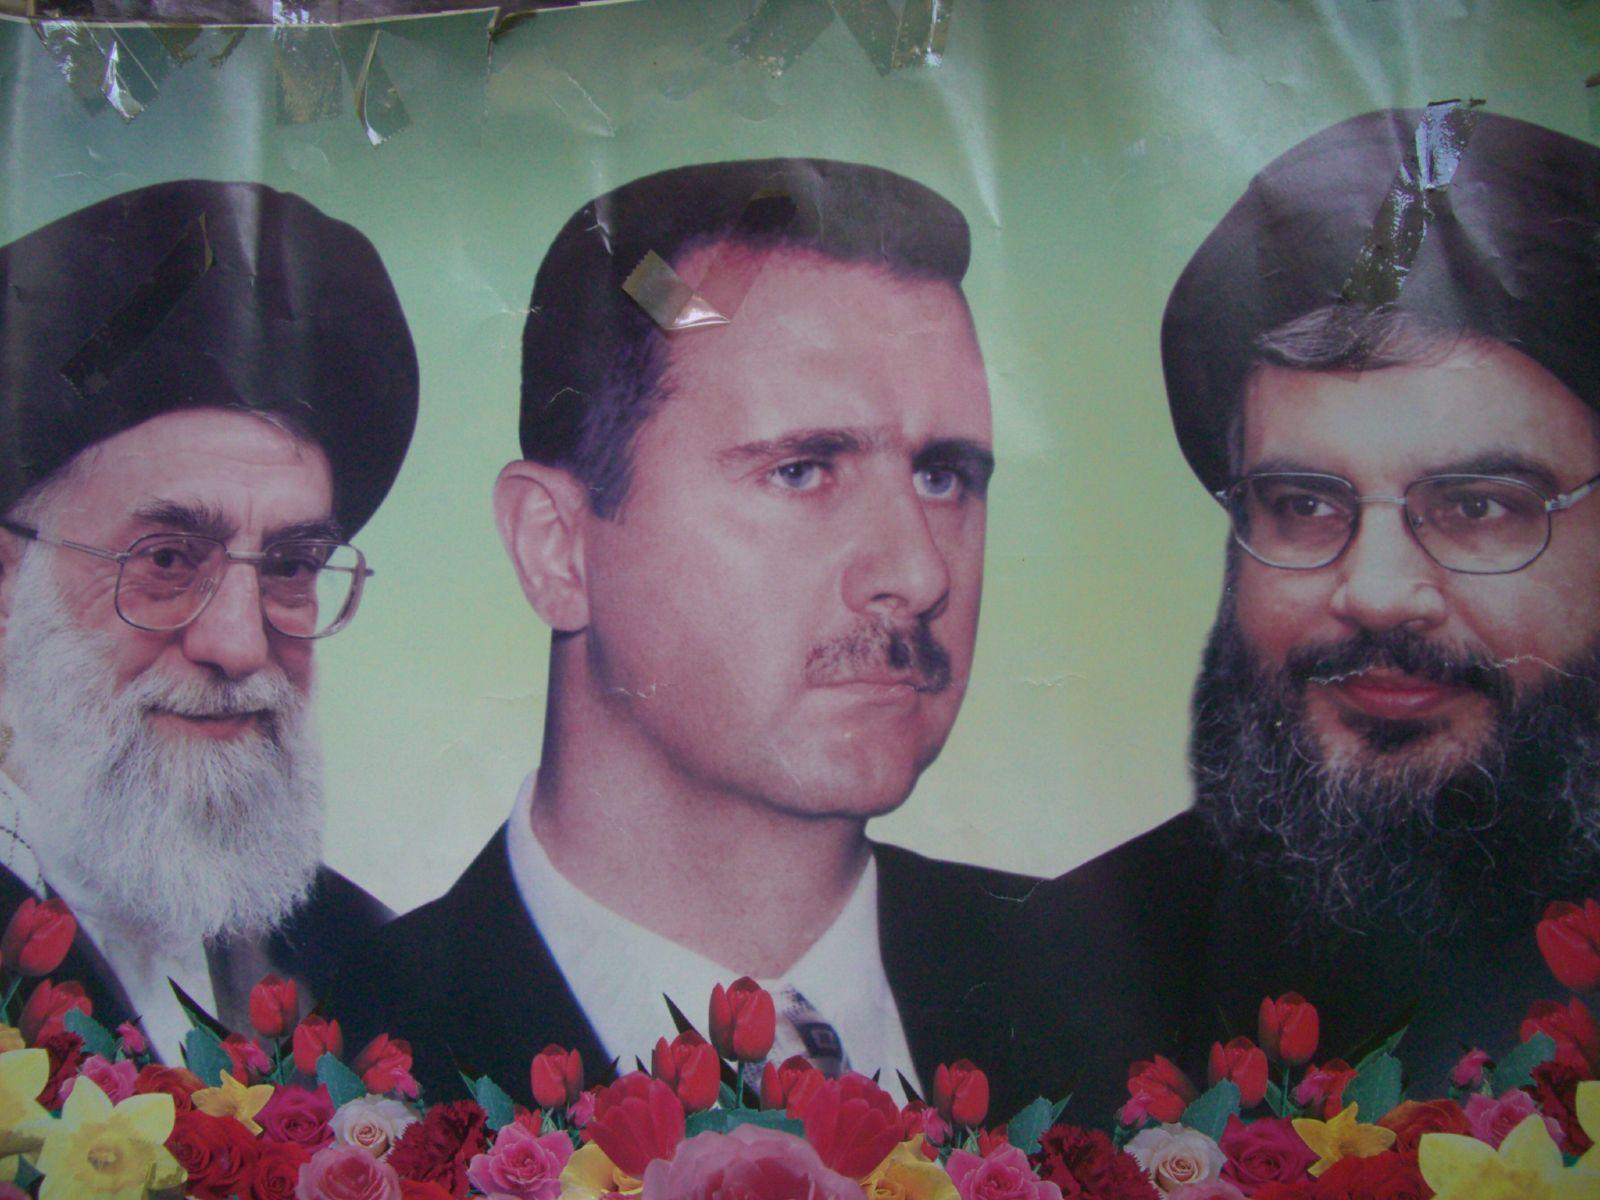 Left to Right: Iran's Ayatollah Khamenei, Syria's President Bashar al Assad, and Hezbollah's Hassan Nasrallah  (Photo: Christopher Wilken |  Flickr )